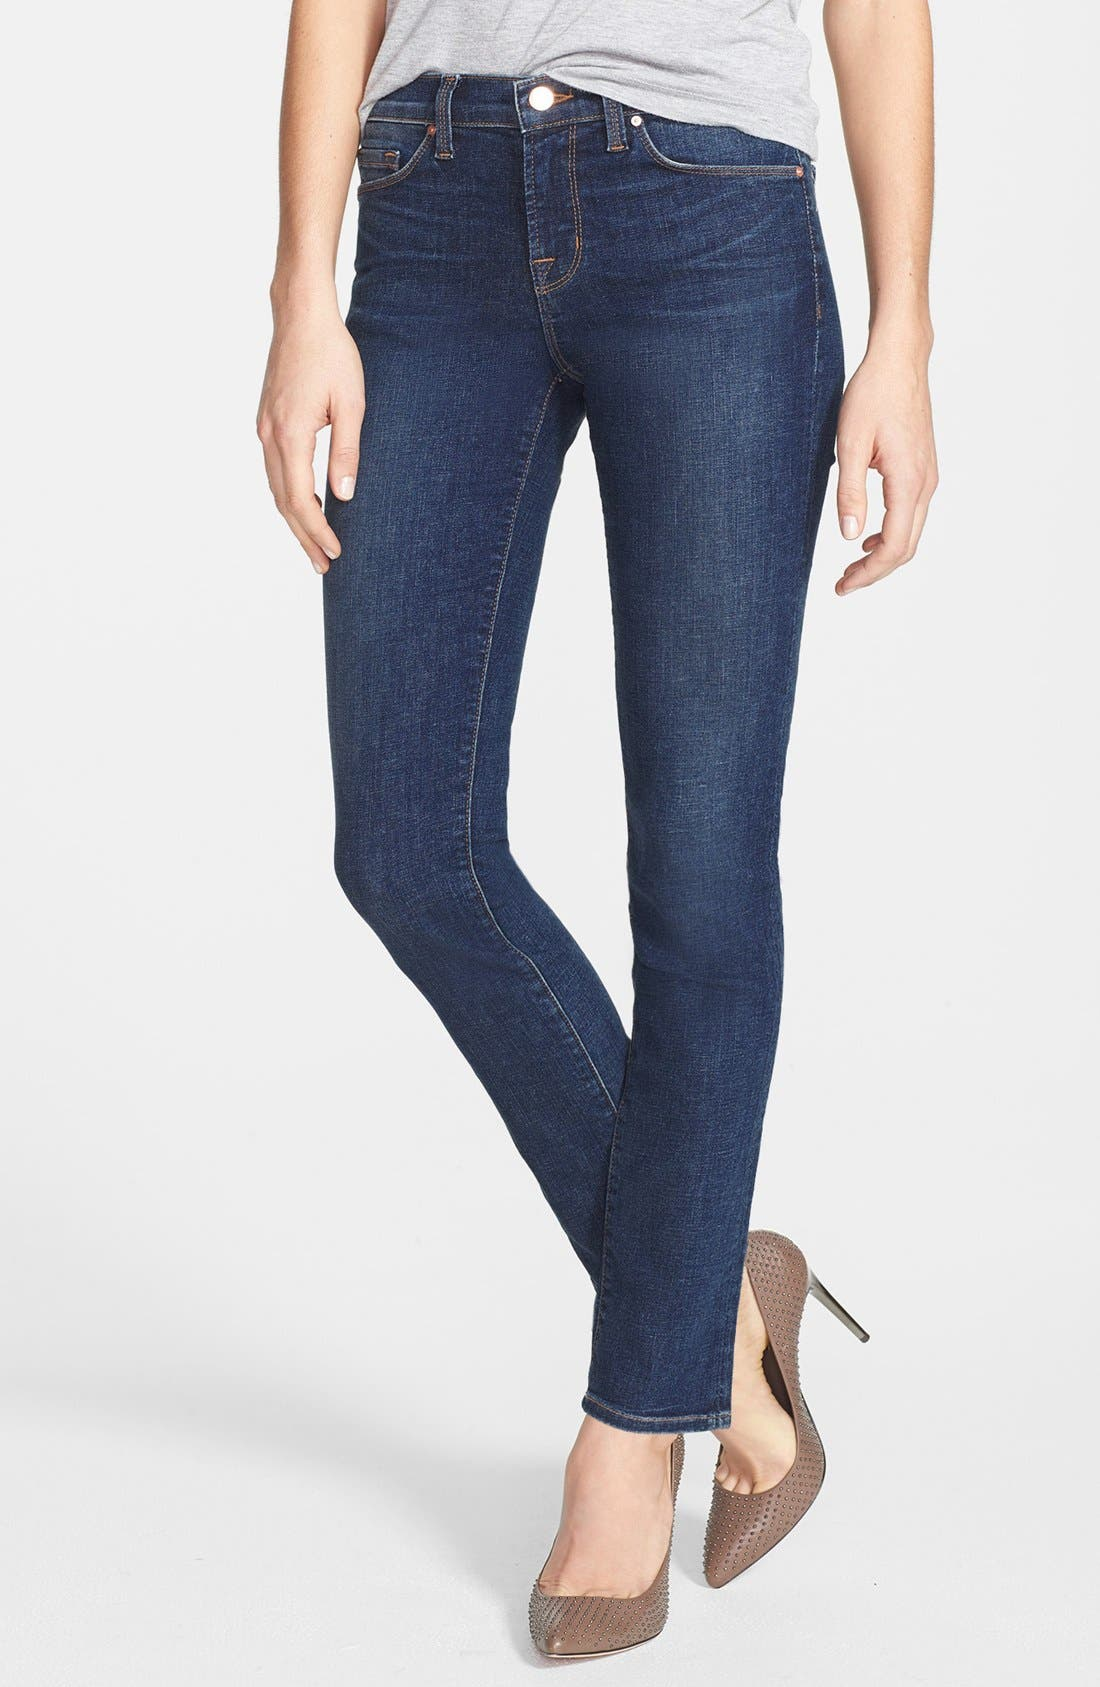 Alternate Image 1 Selected - J Brand Mid Rise Skinny Jeans (Waltz)